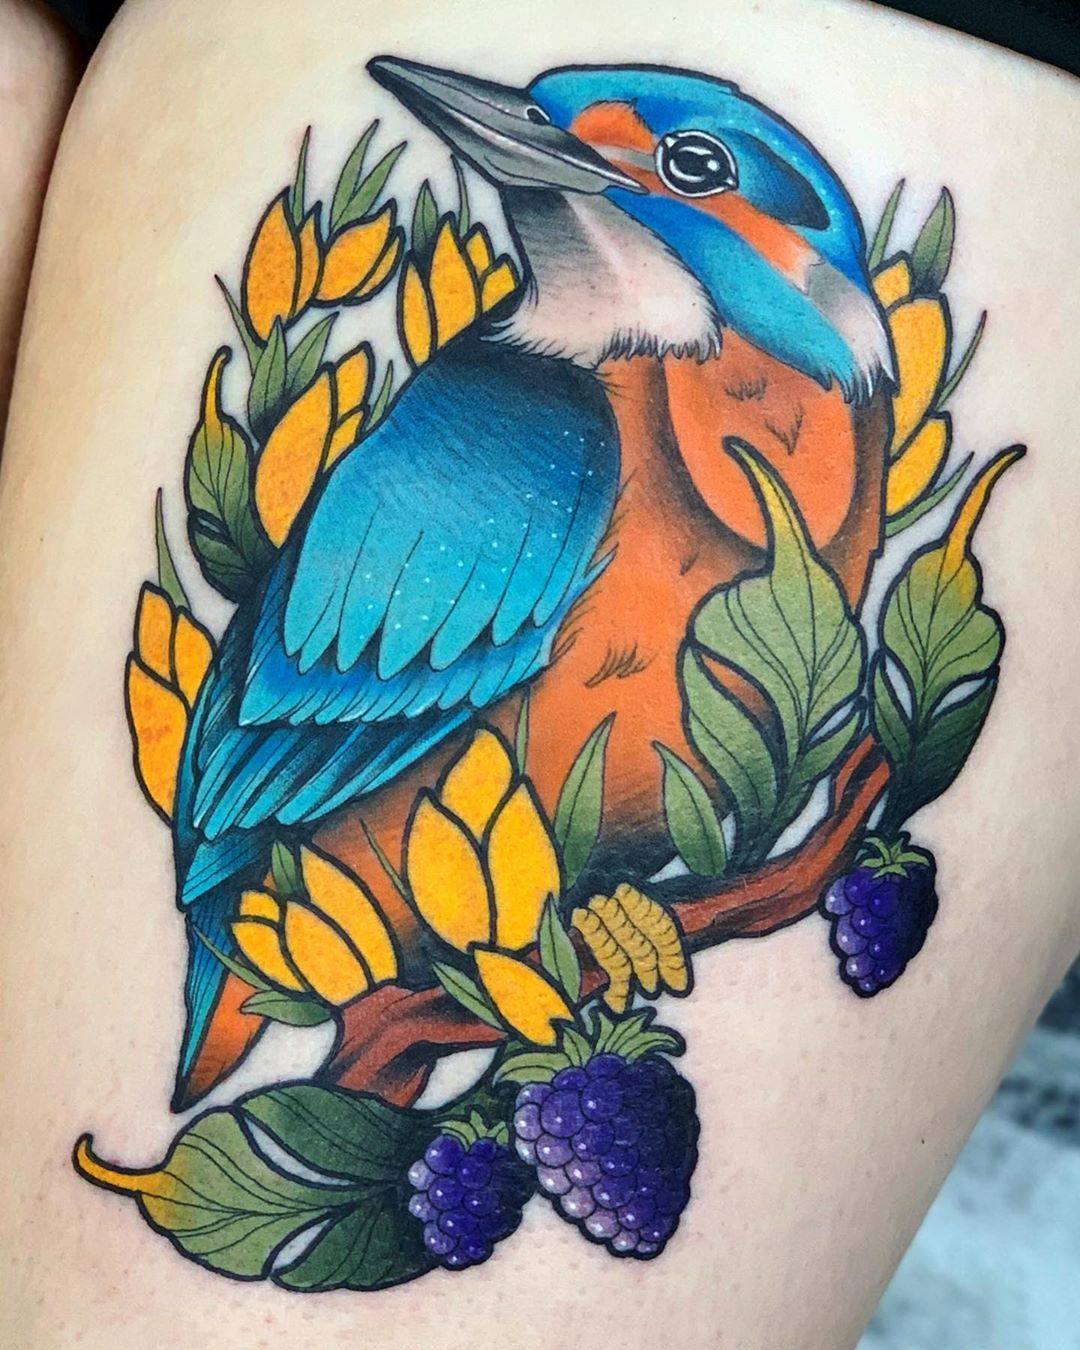 lennoxtattoo in 2020 Tätowierungen, Tattoo spirit